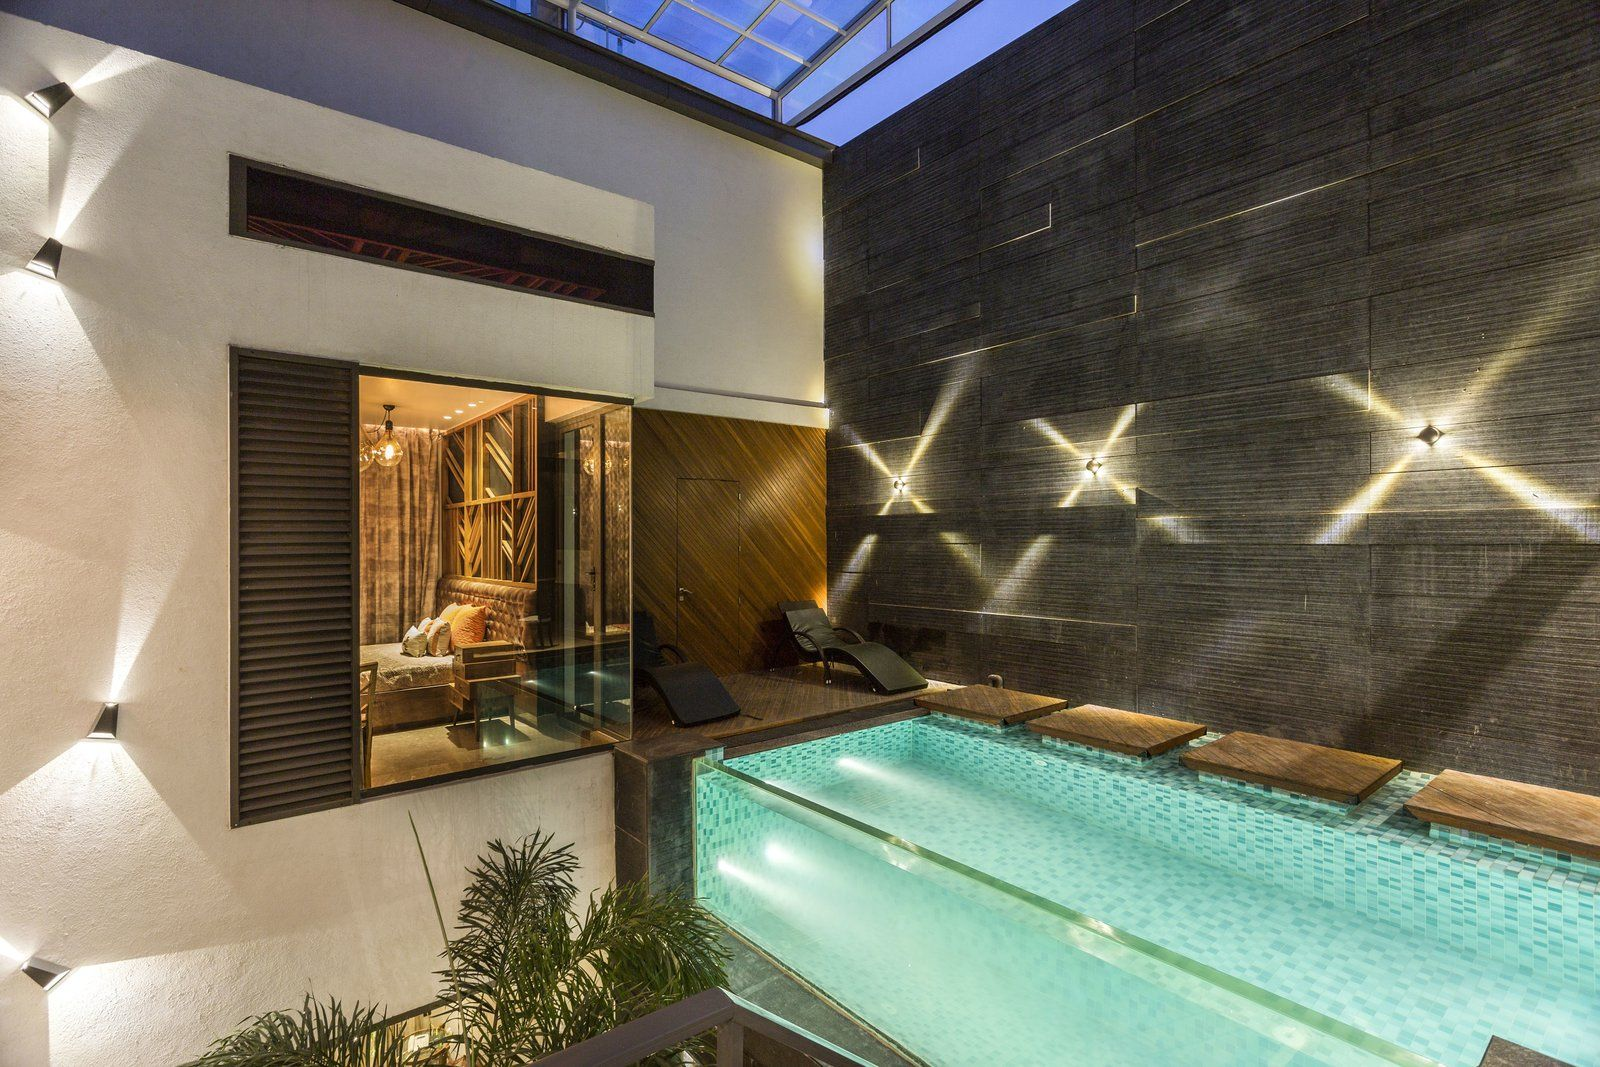 Pool Yard House Modern House Design House House Design